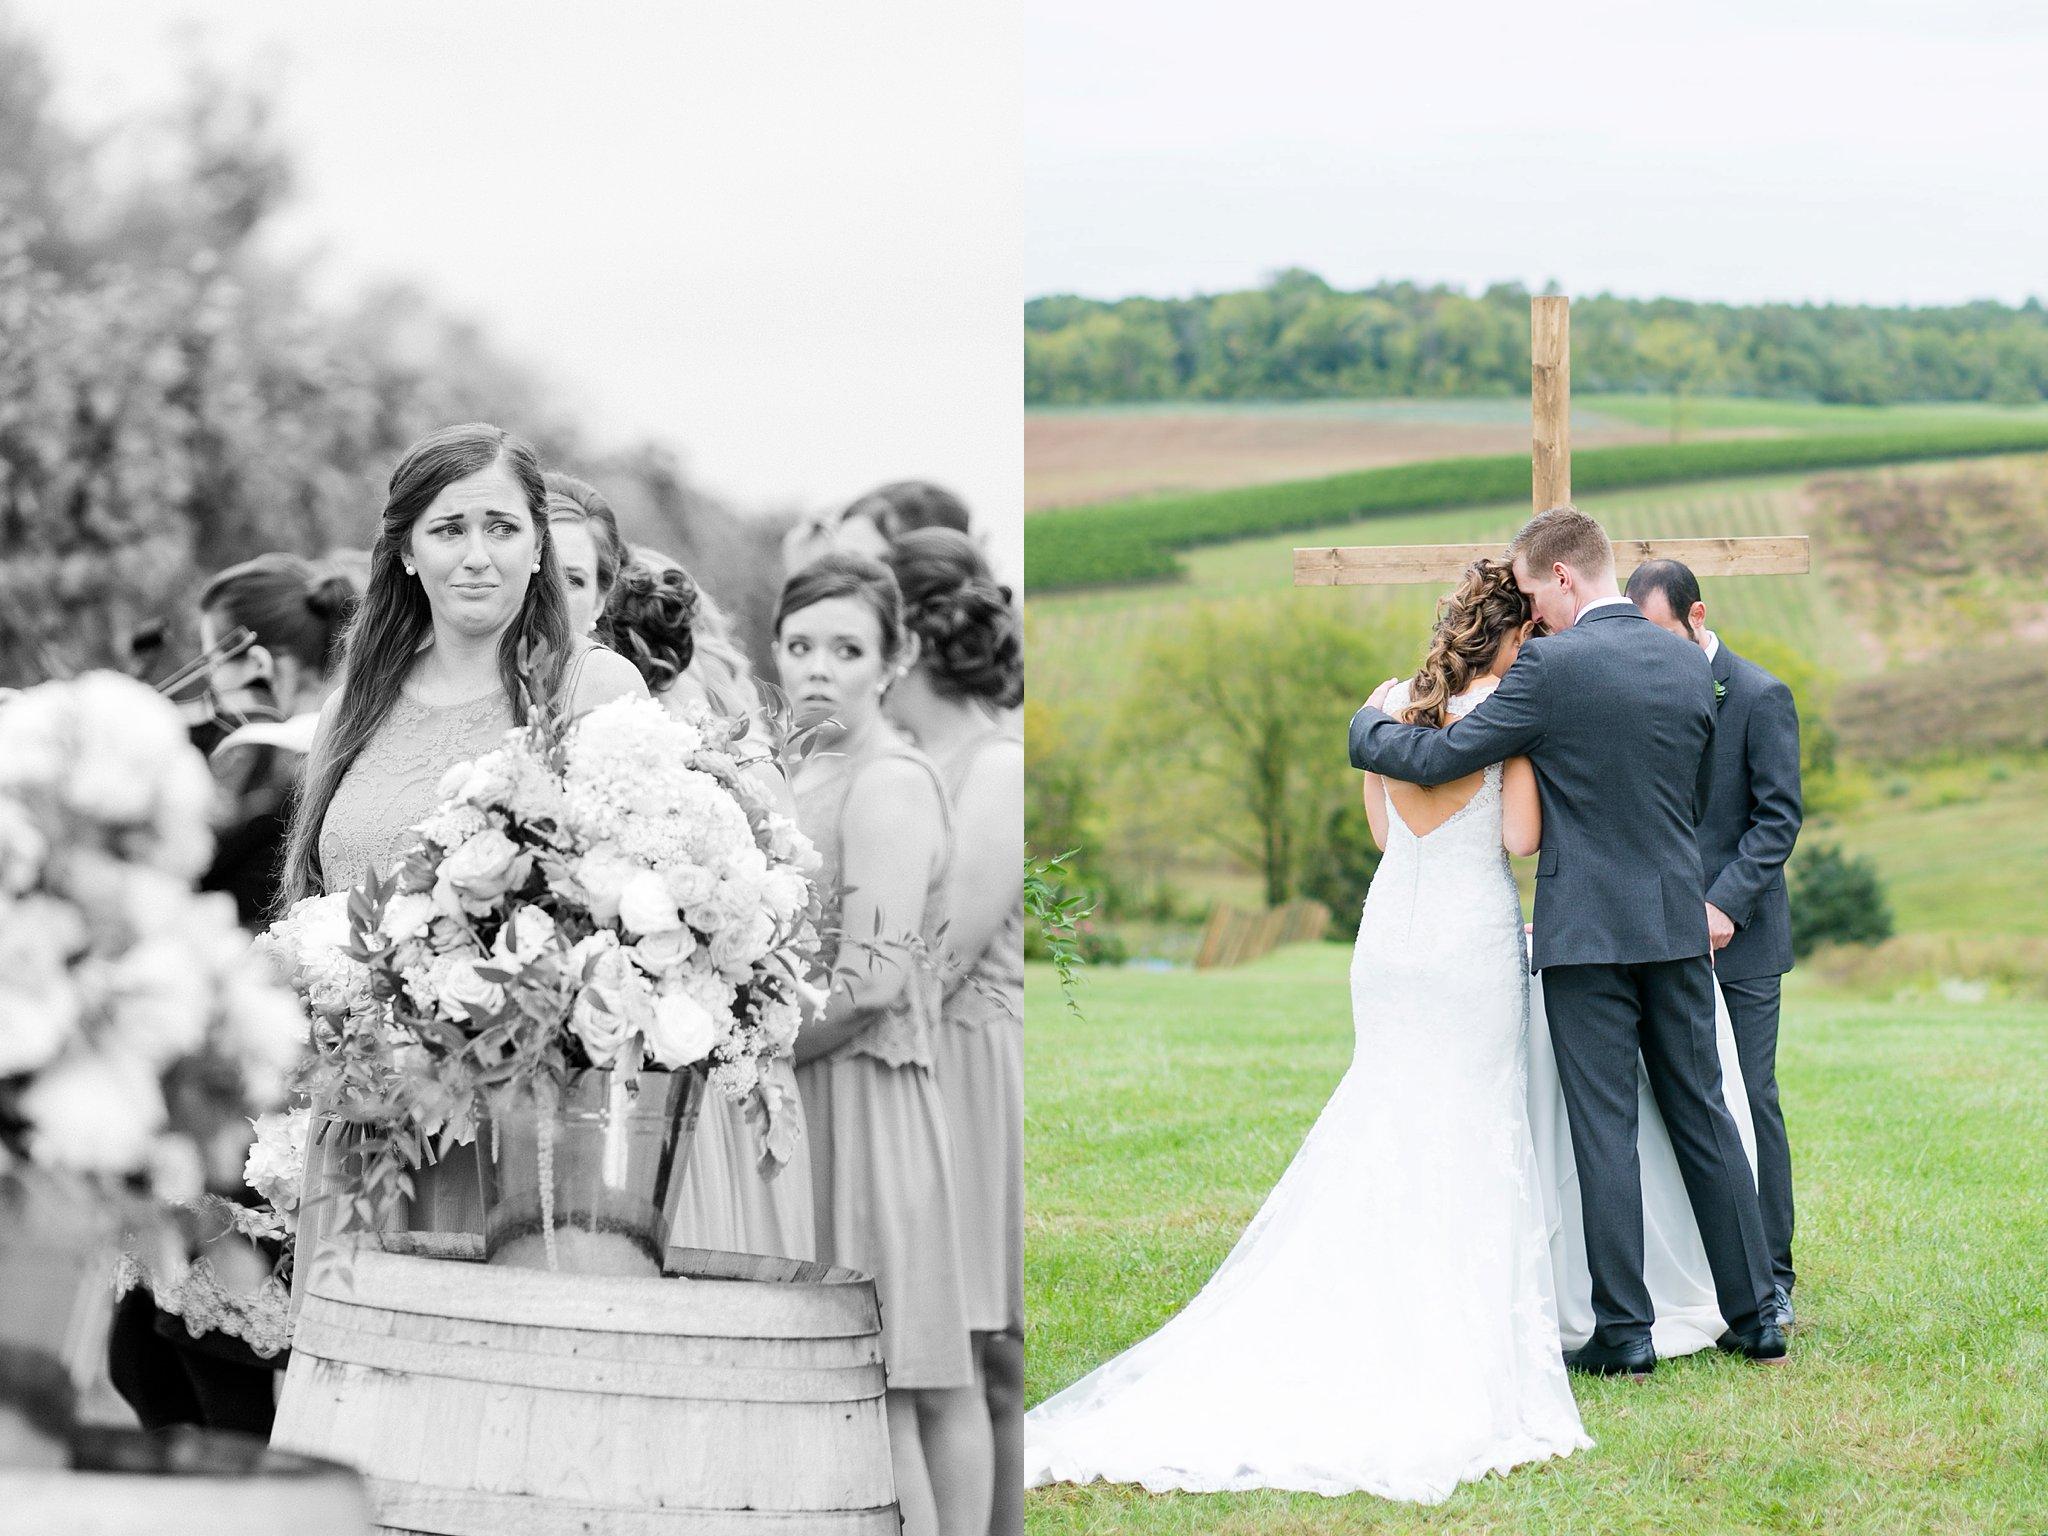 Stone Tower Winery Wedding Photos Virginia Wedding Photographer Megan Kelsey Photography Sam & Angela-157.jpg